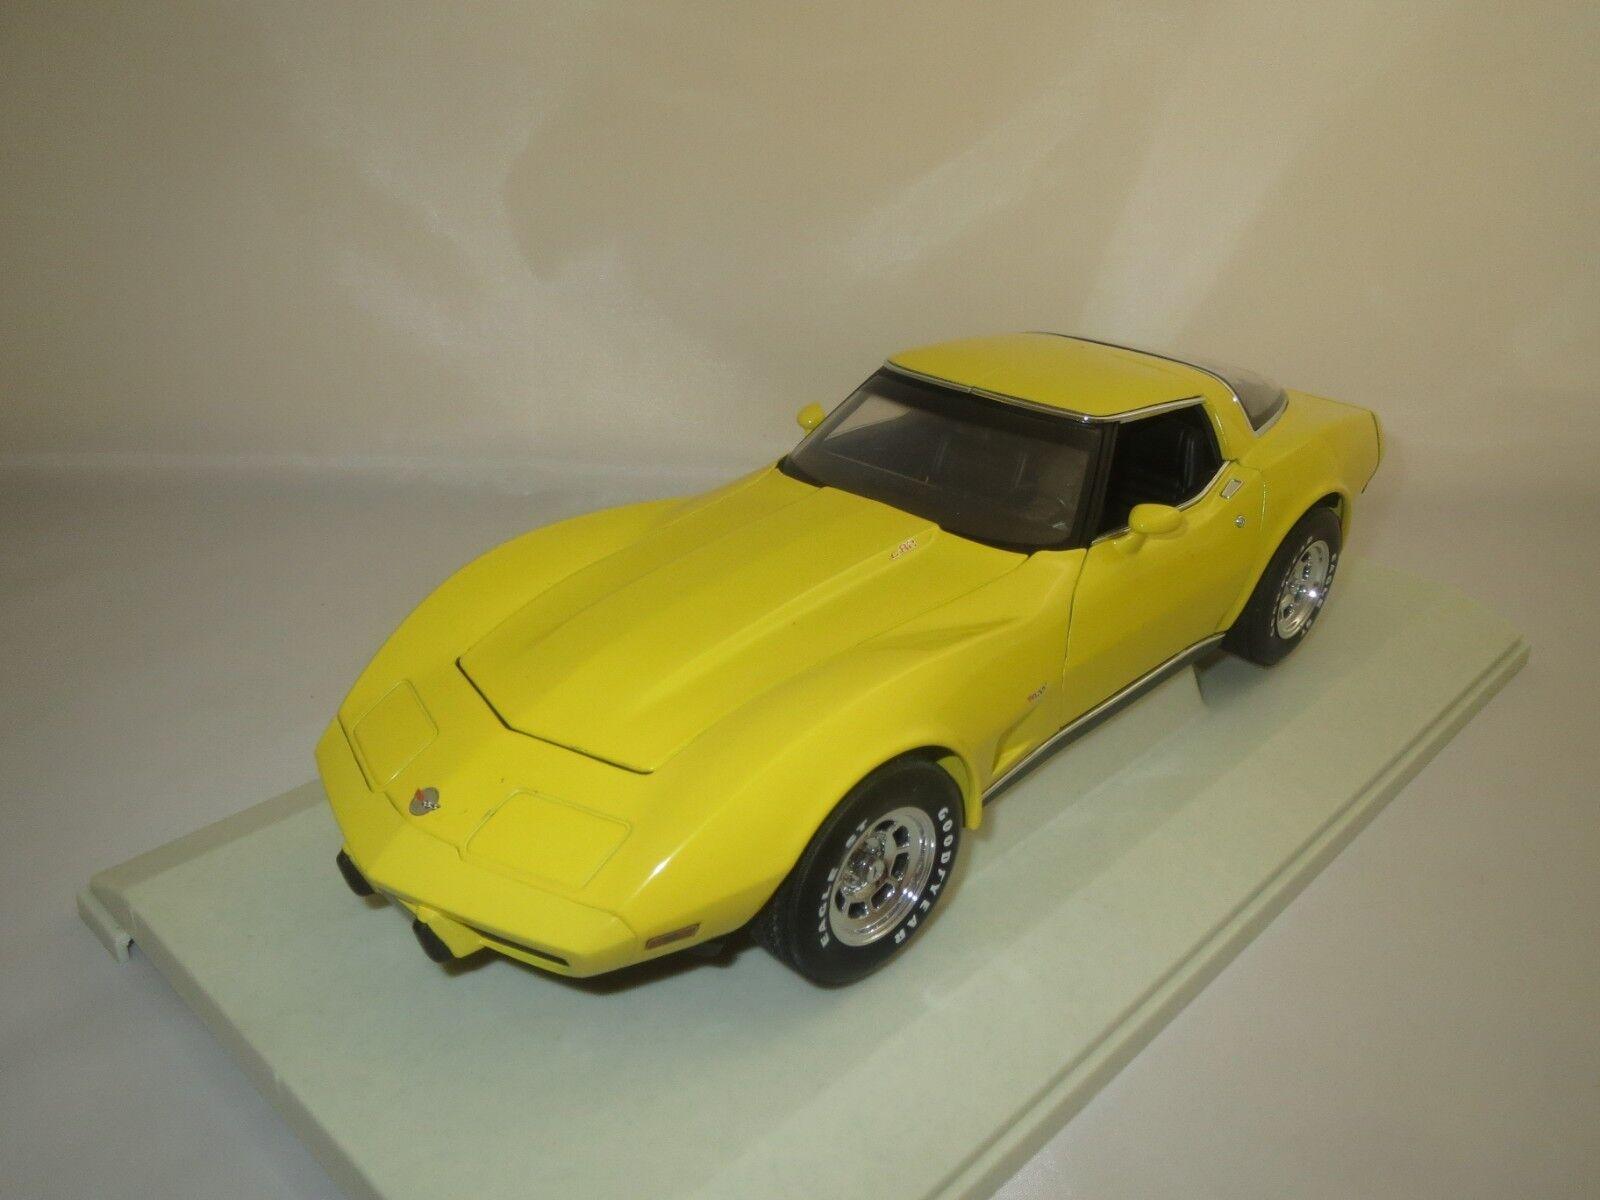 UT MODELS 21074 CHEVROLET CORVETTE Coupè  1978  (jaune) 1 18 neuf dans sa boîte